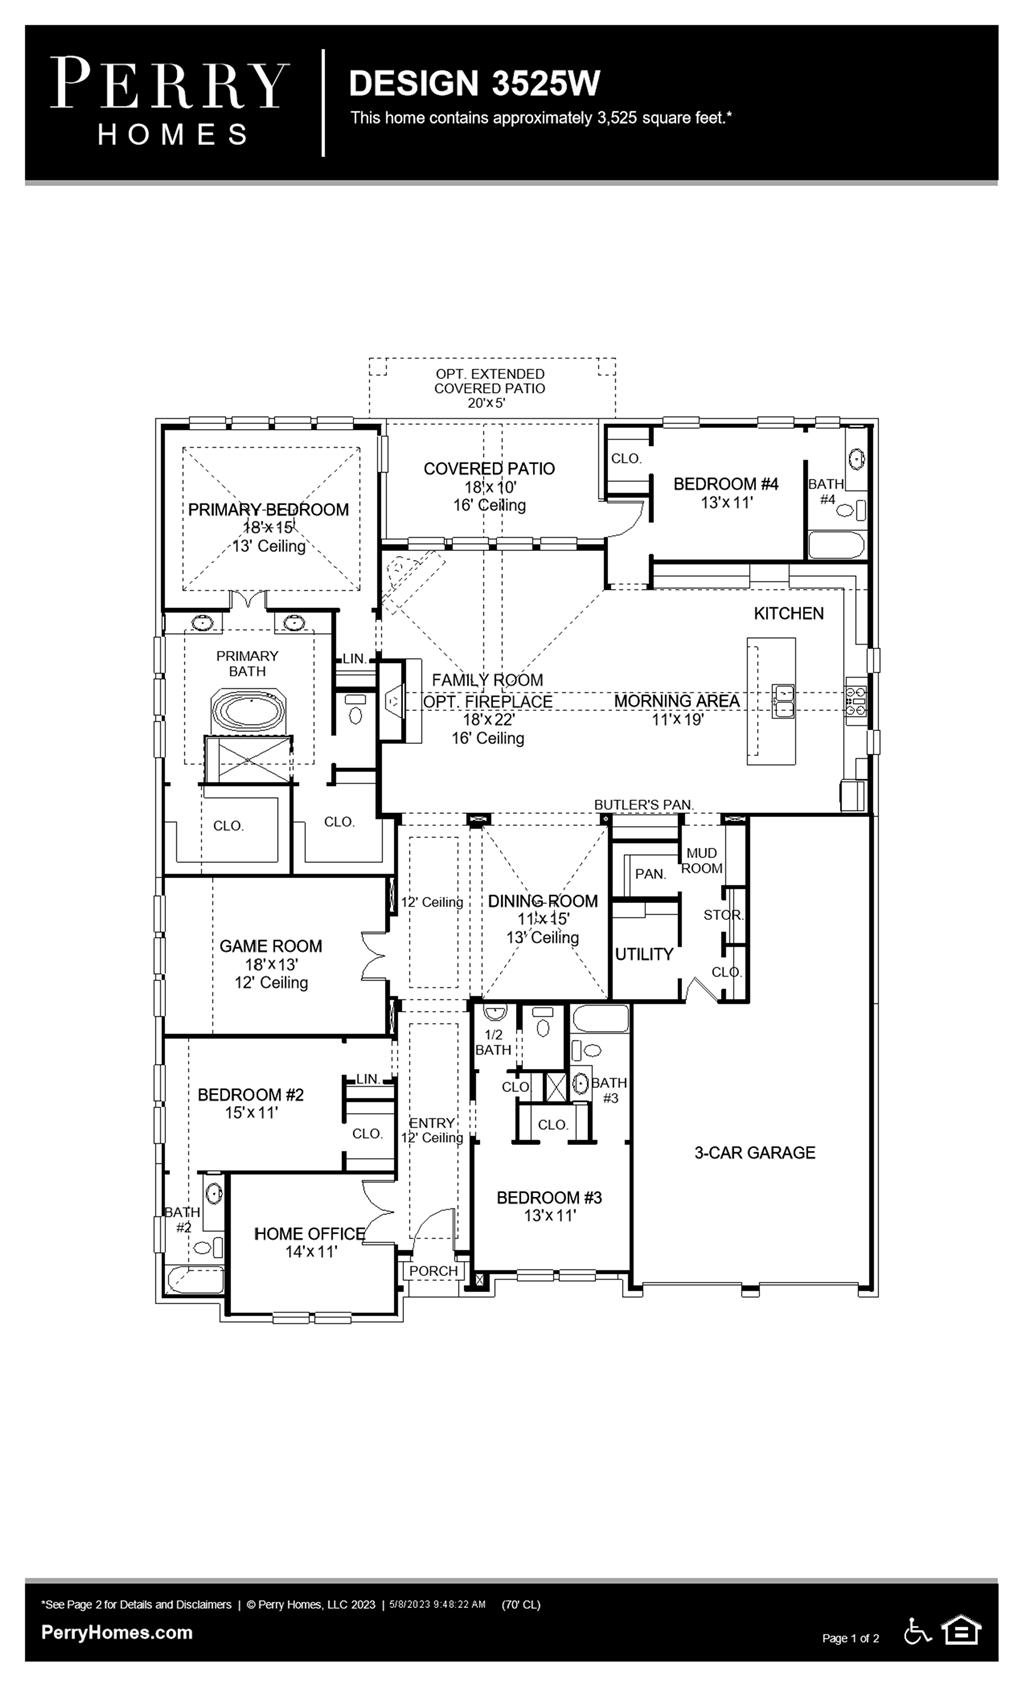 Floor Plan for 3525W